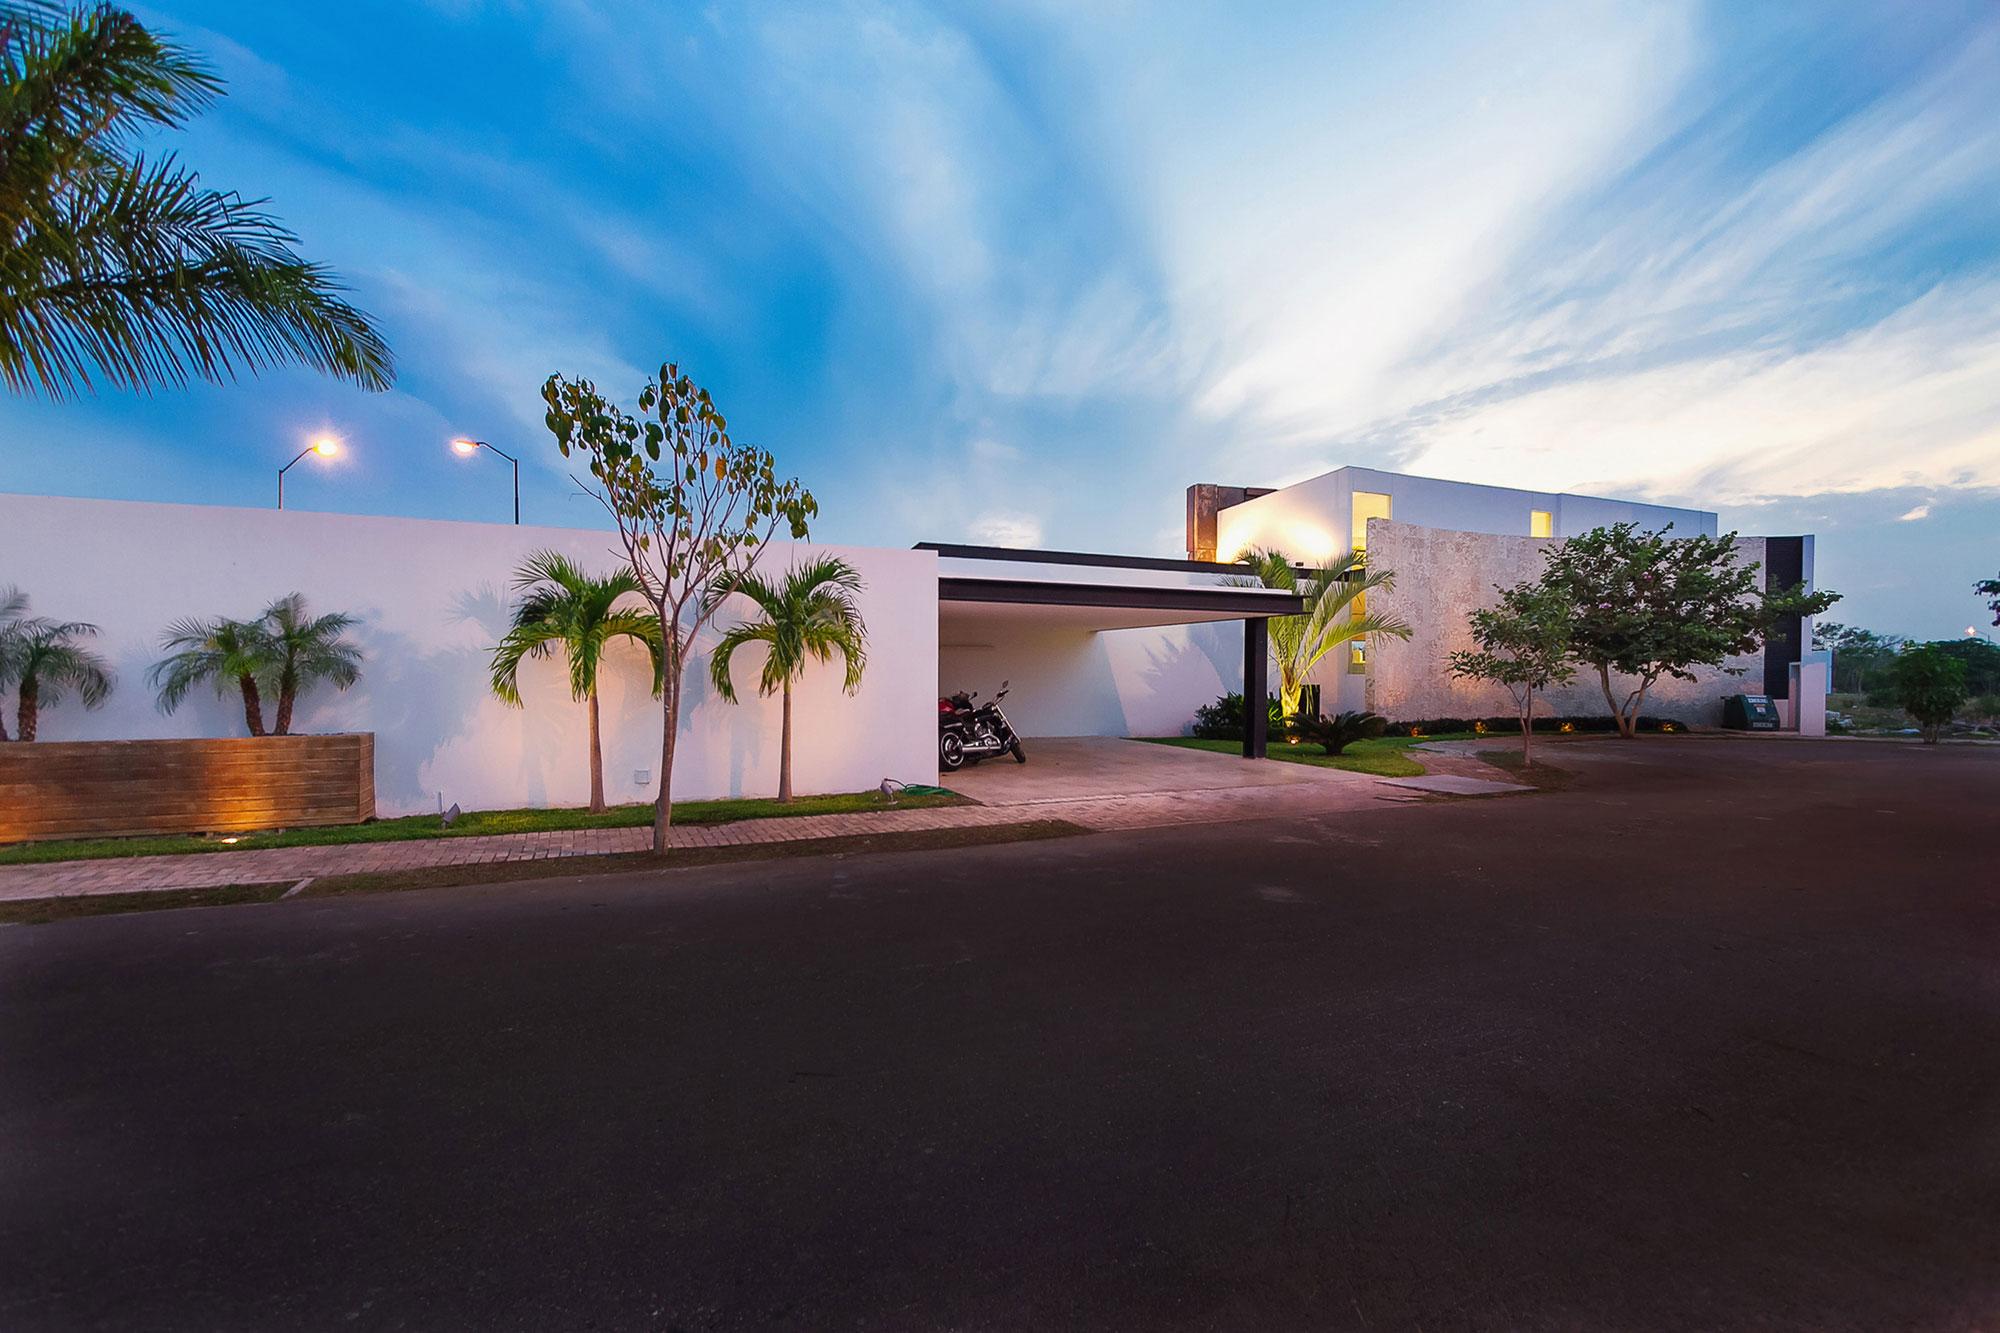 Entrance, Carport, Contemporary Residence in Merida, Yucatan